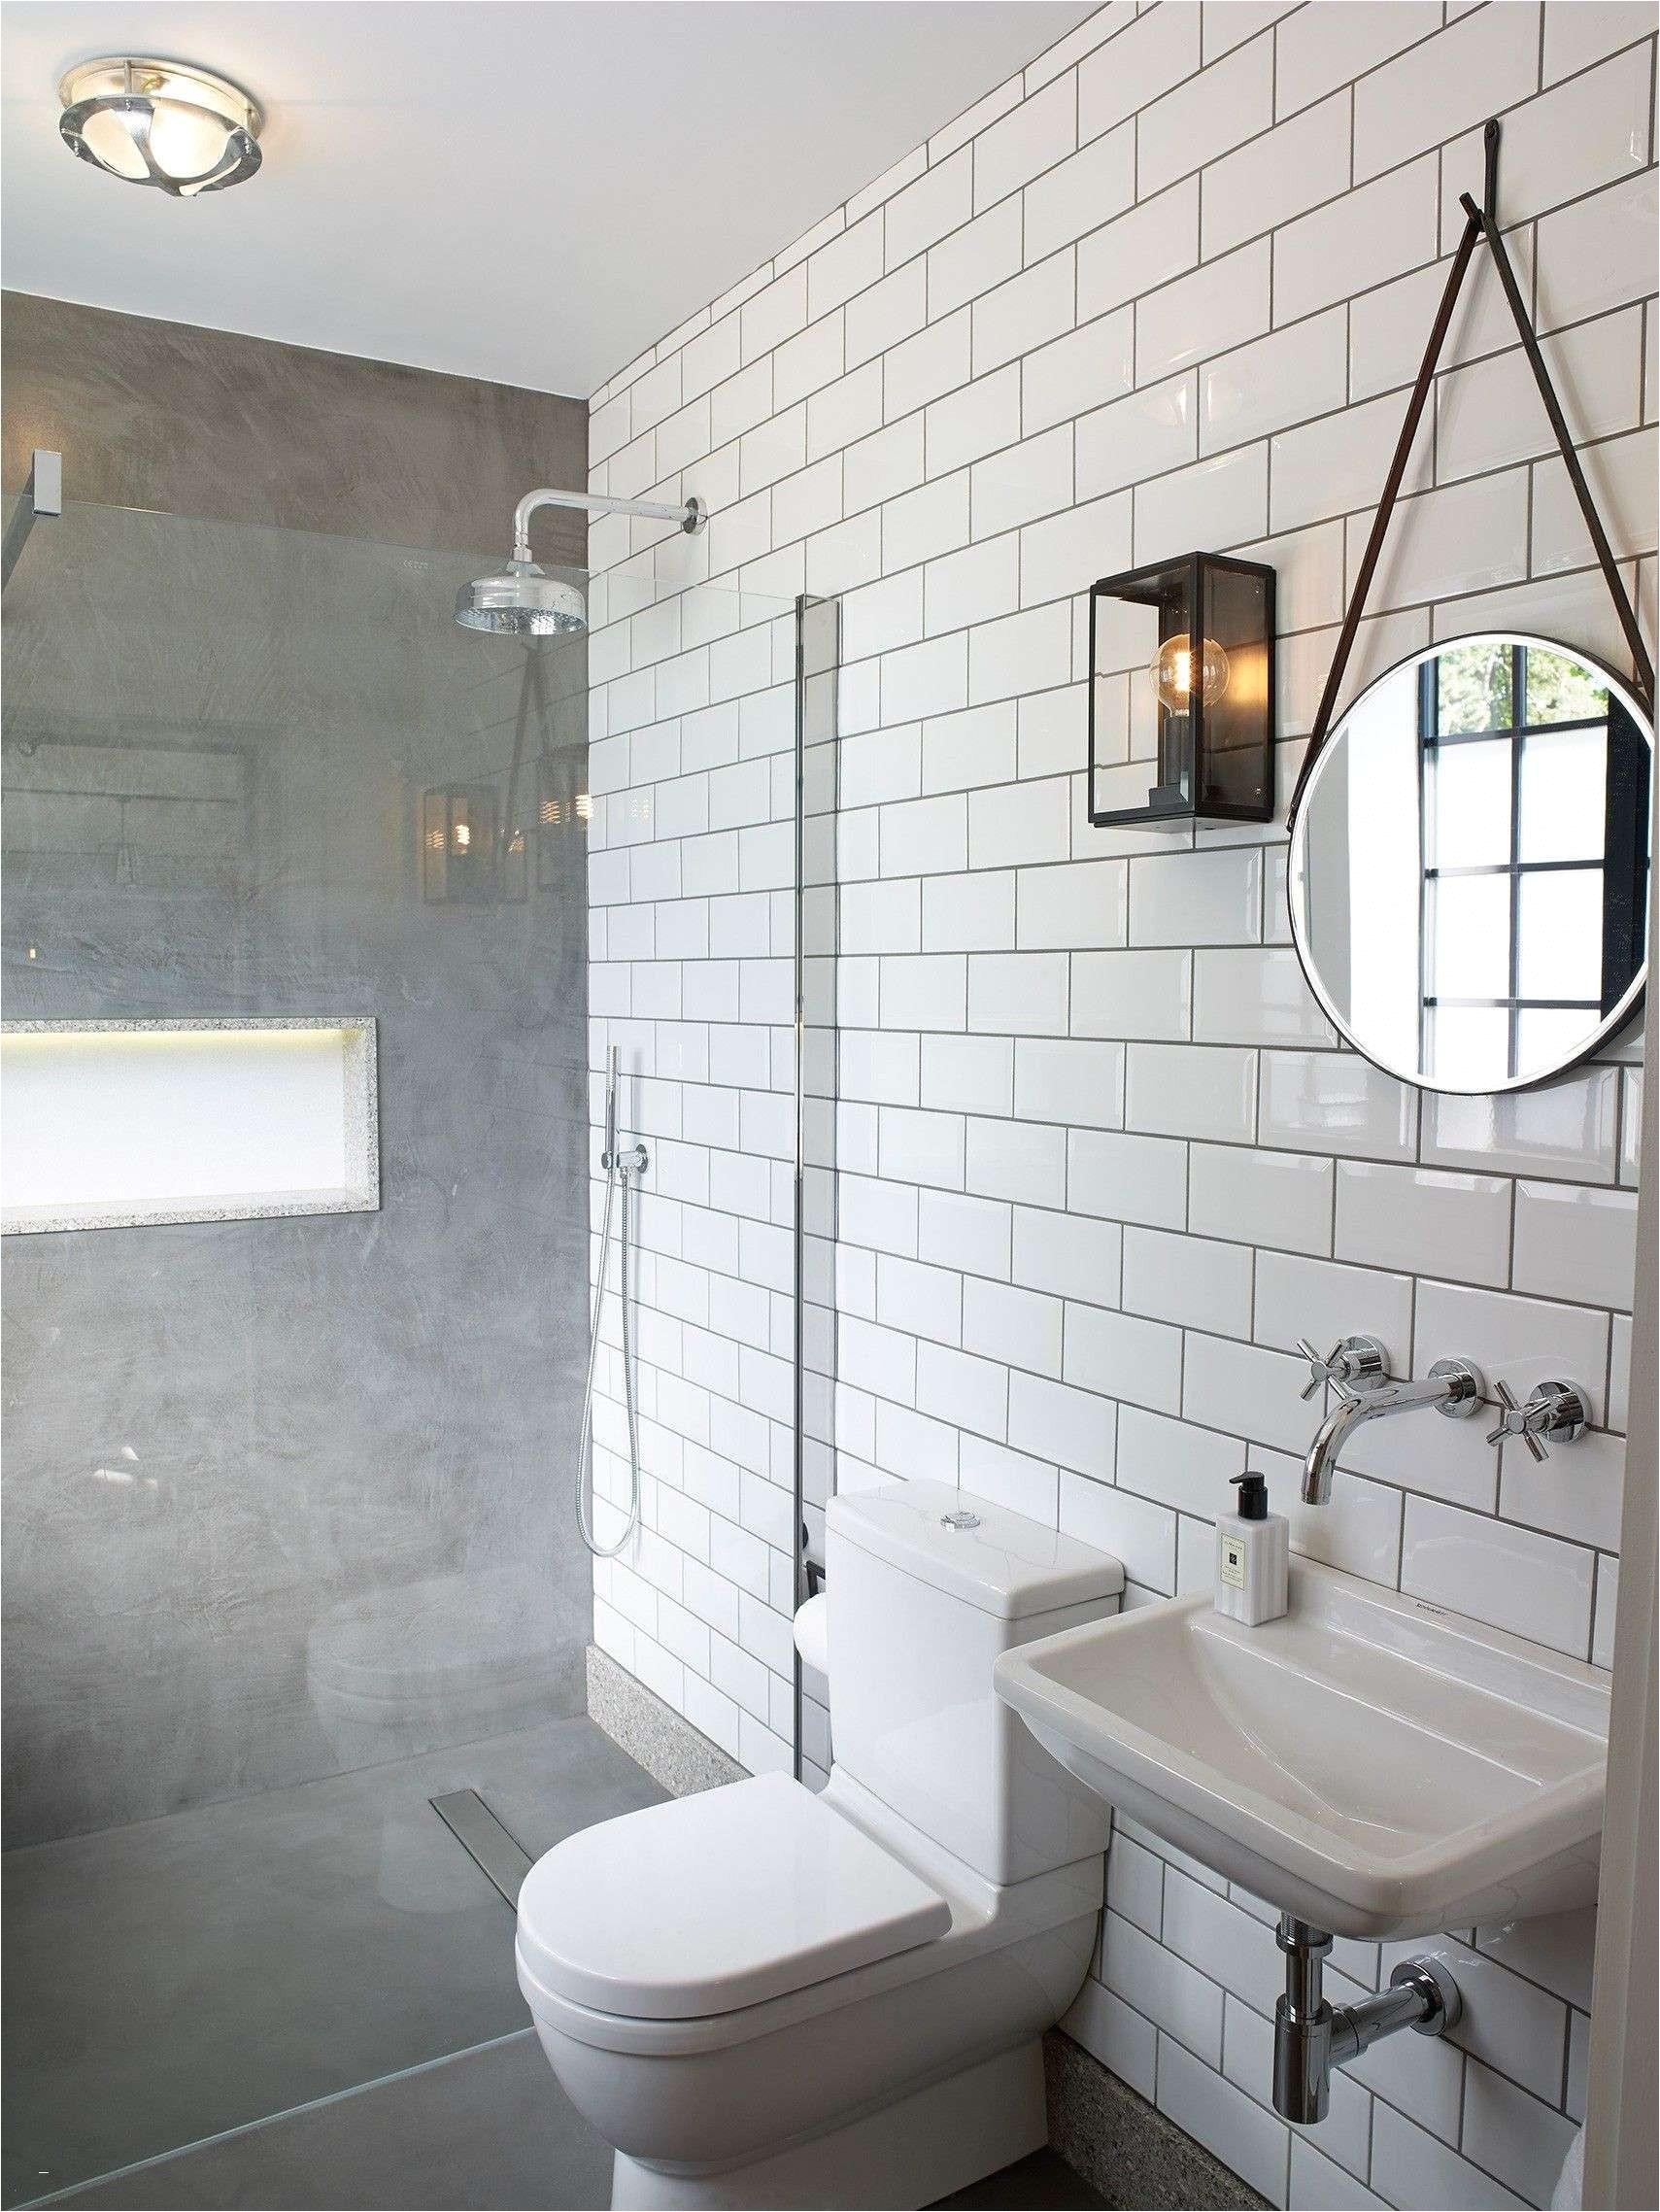 small bathroom decorating ideas fresh bathroom wall decor ideas incredible tag toilet ideas 0d mucsat